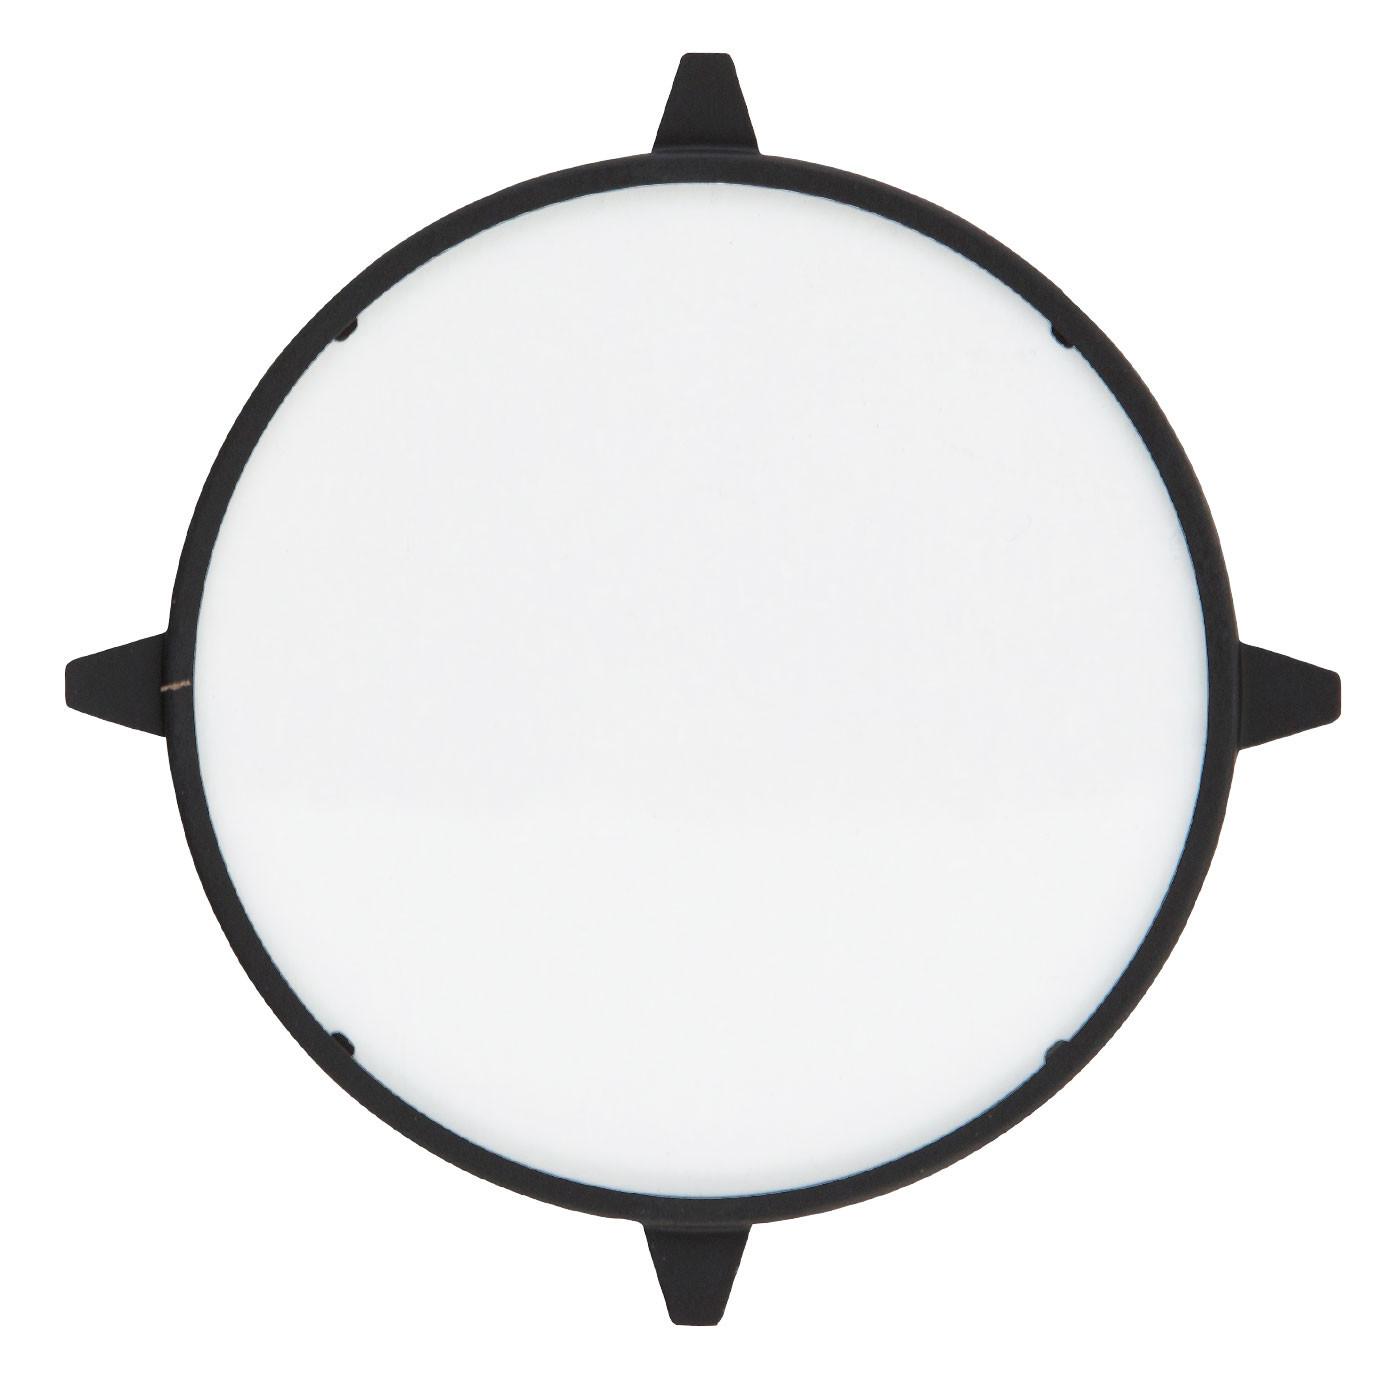 Luceplan Berenice Ersatz-Schutzglas